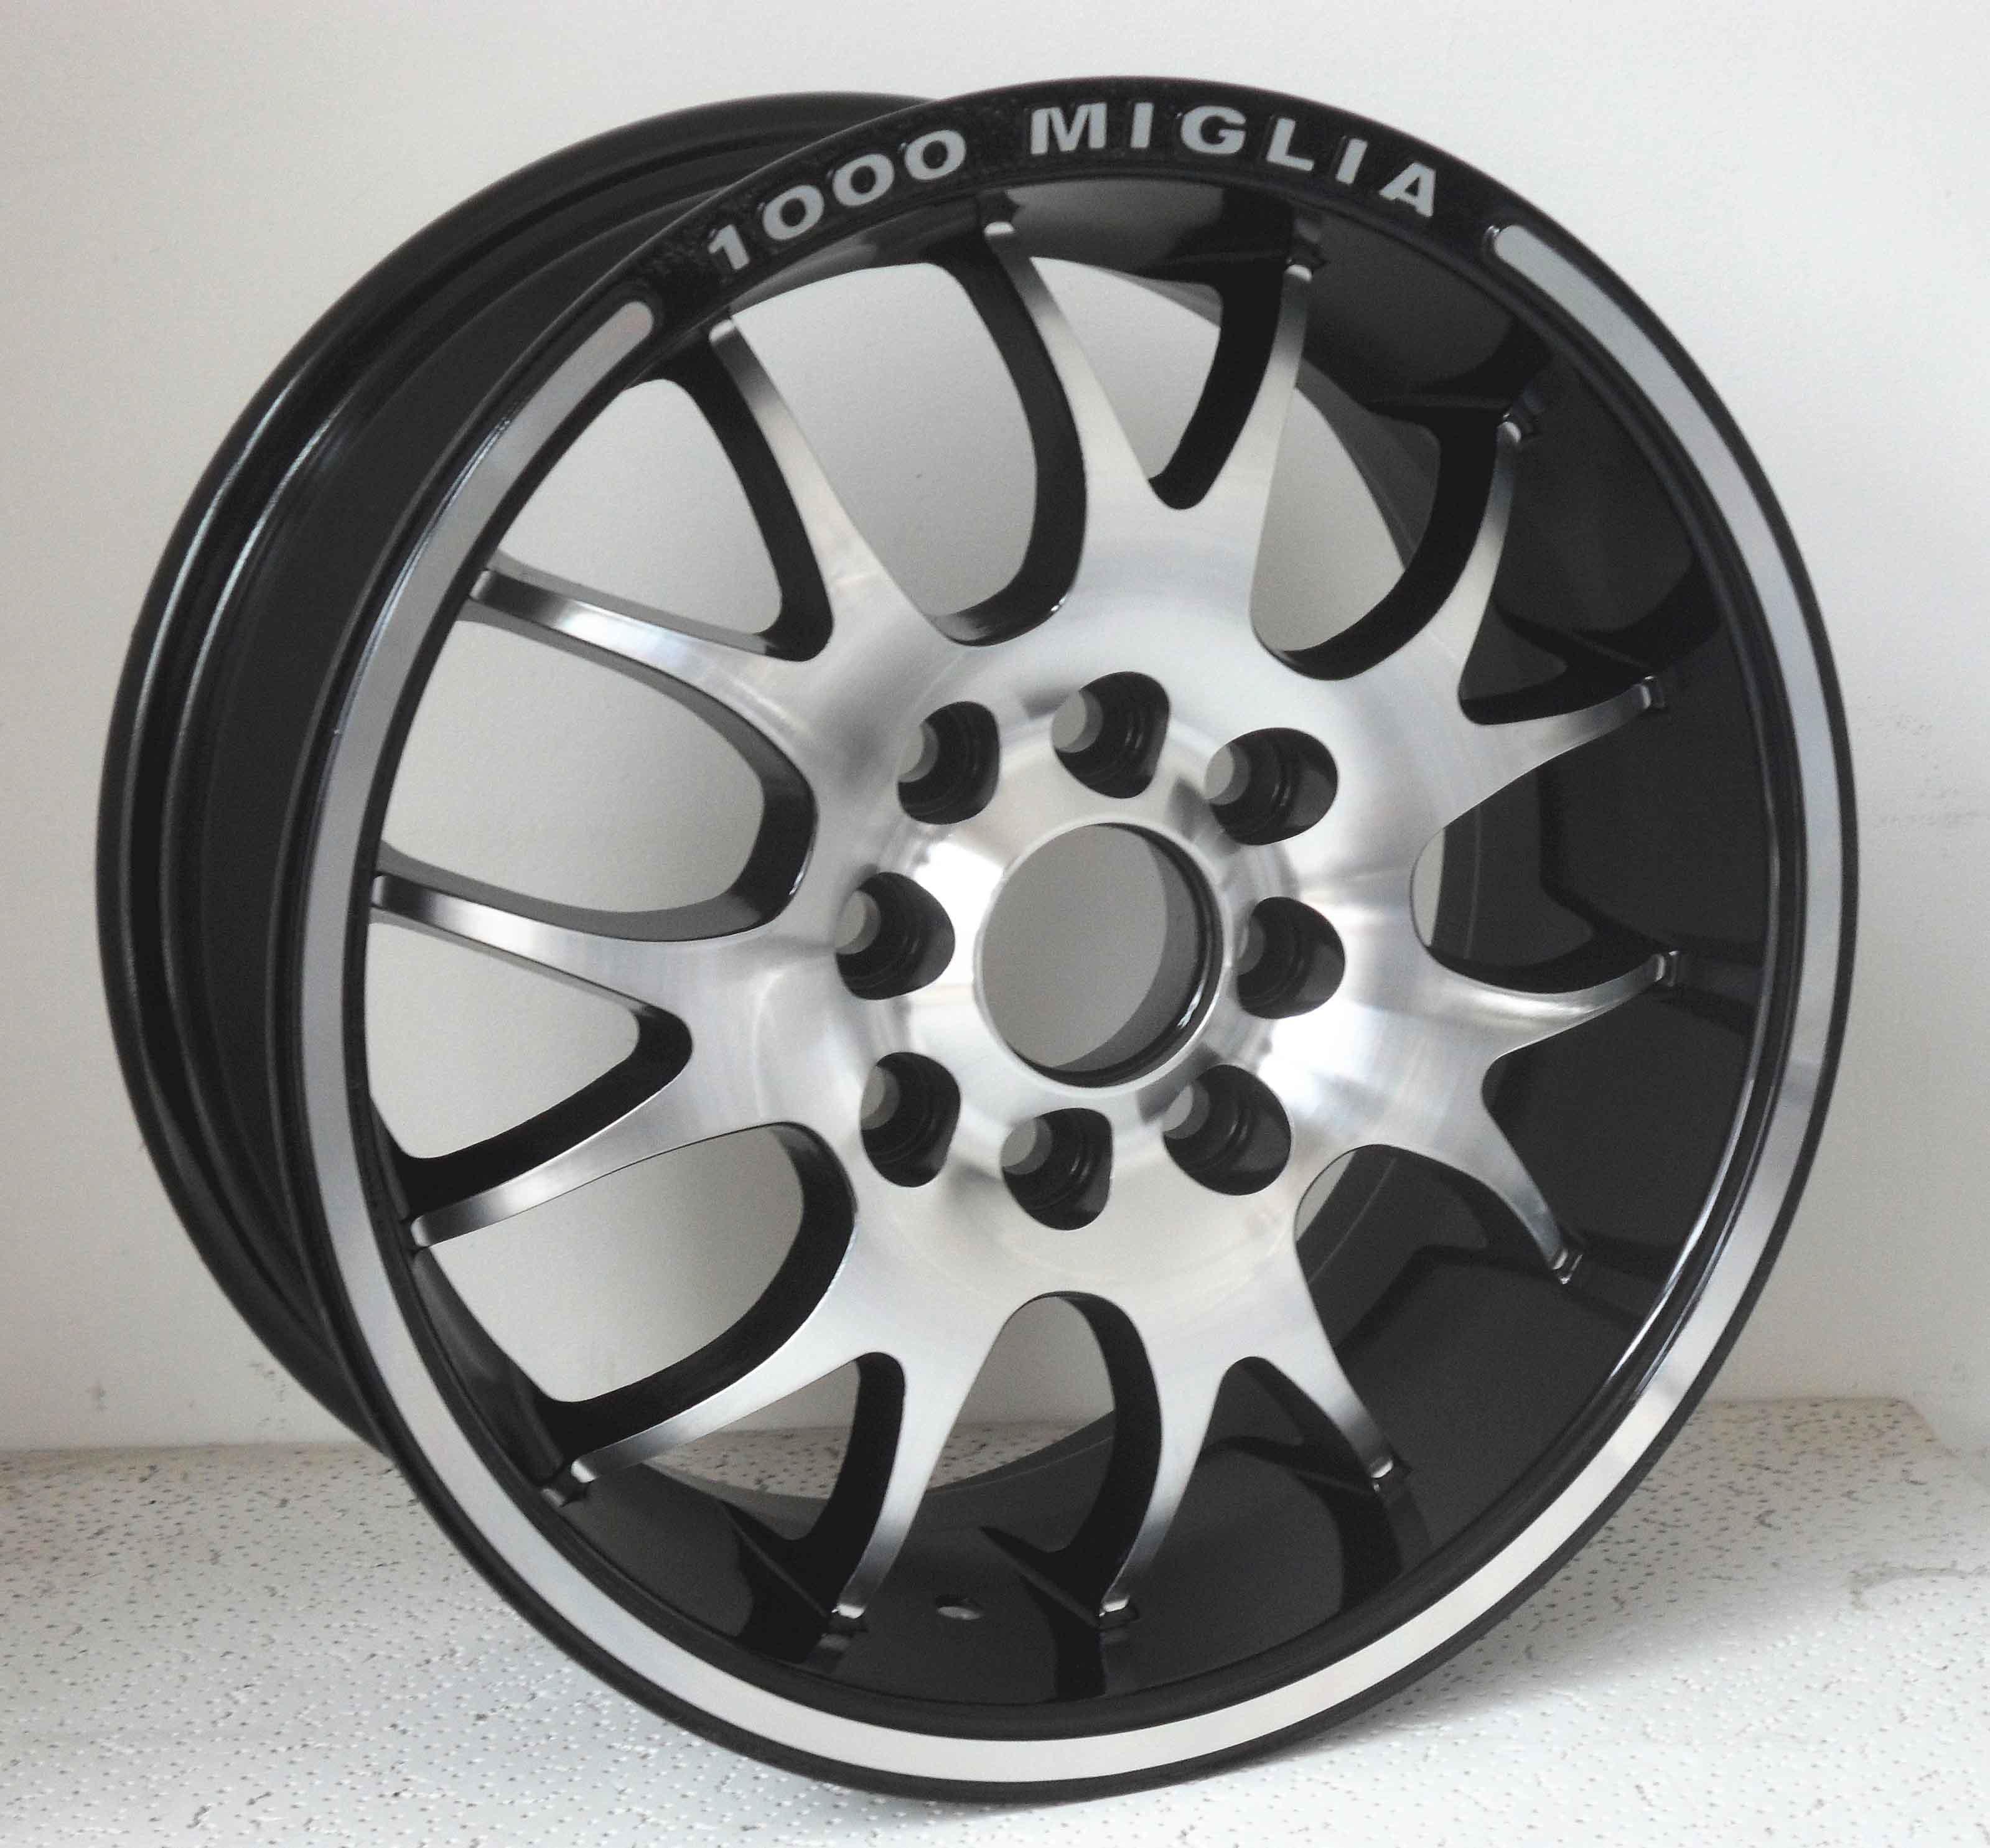 Aftermarket Alloy Wheel (KC515)